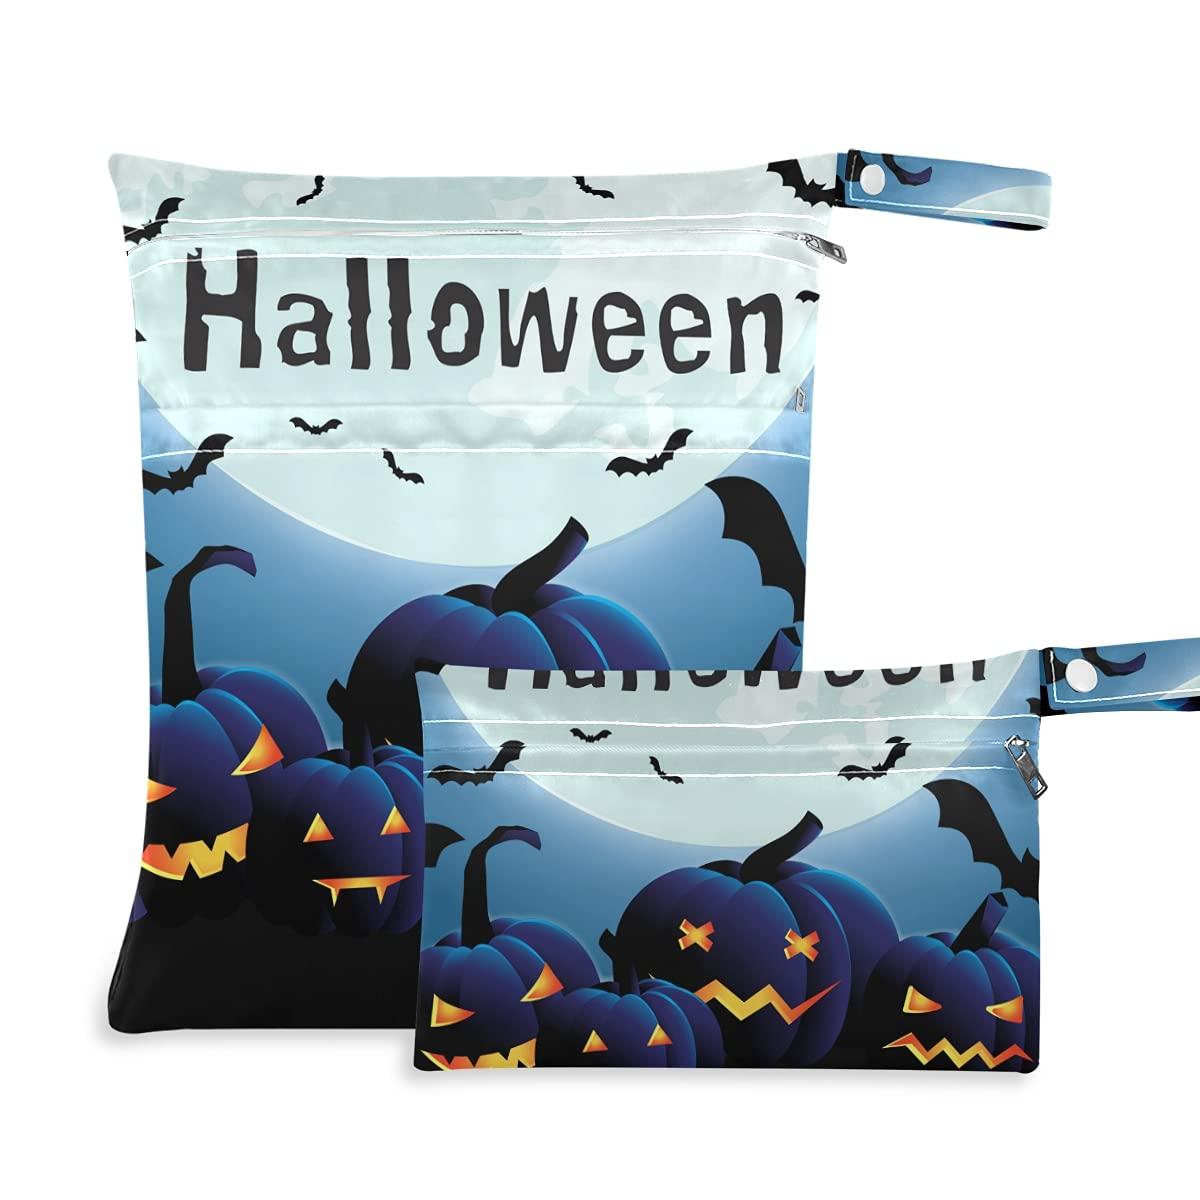 Halloween Funny Pumpkins Bat Wet Diaper Reusable Dry Excellent Bag Sales for sale